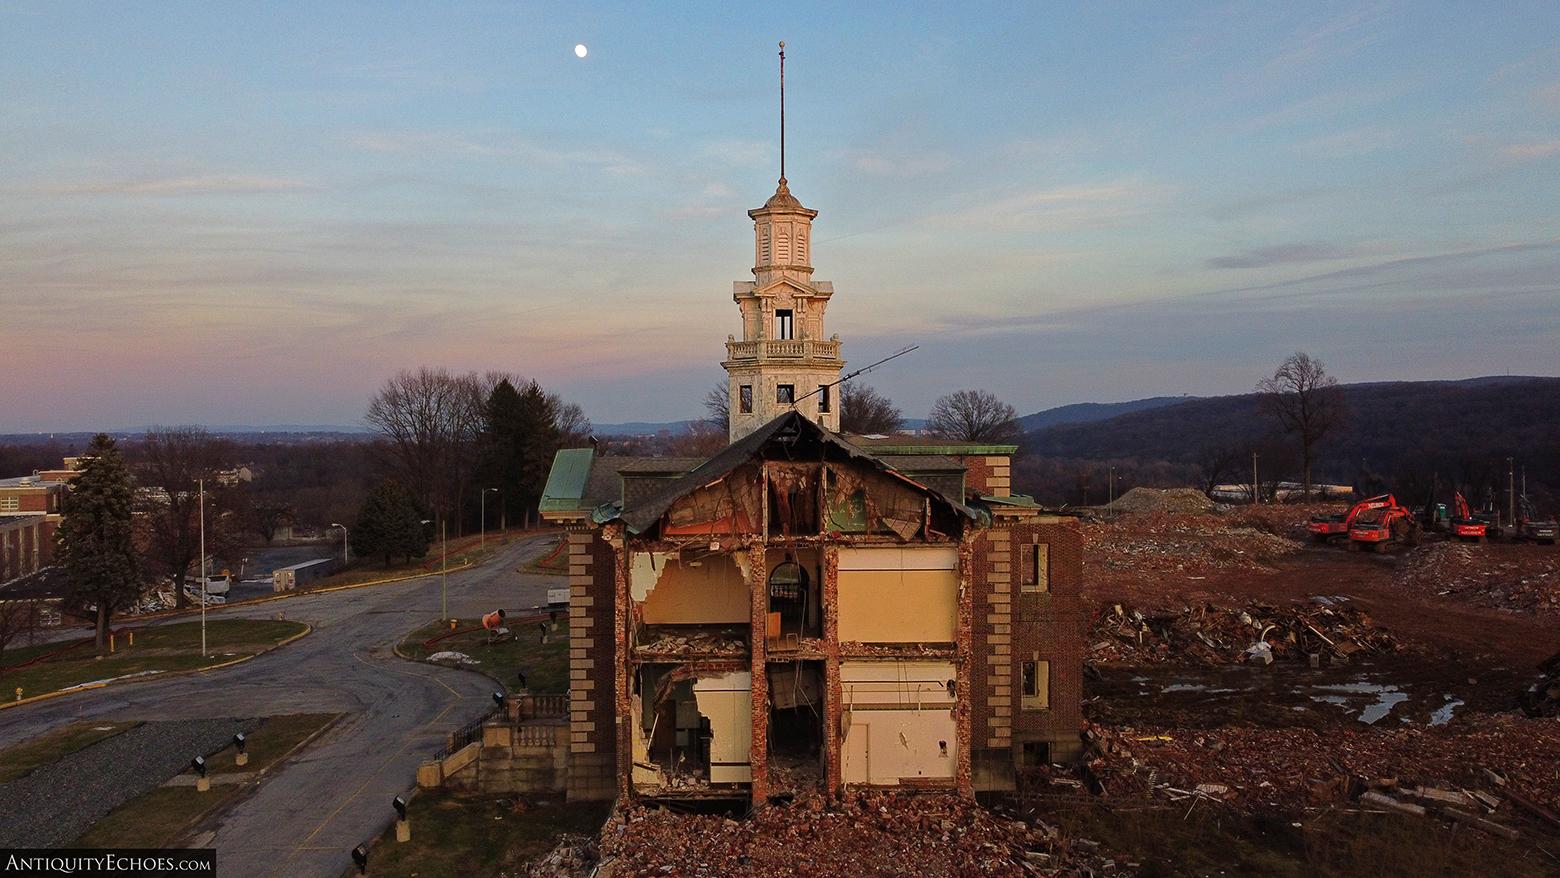 Allentown State Hospital - Demolition - Torn Apart